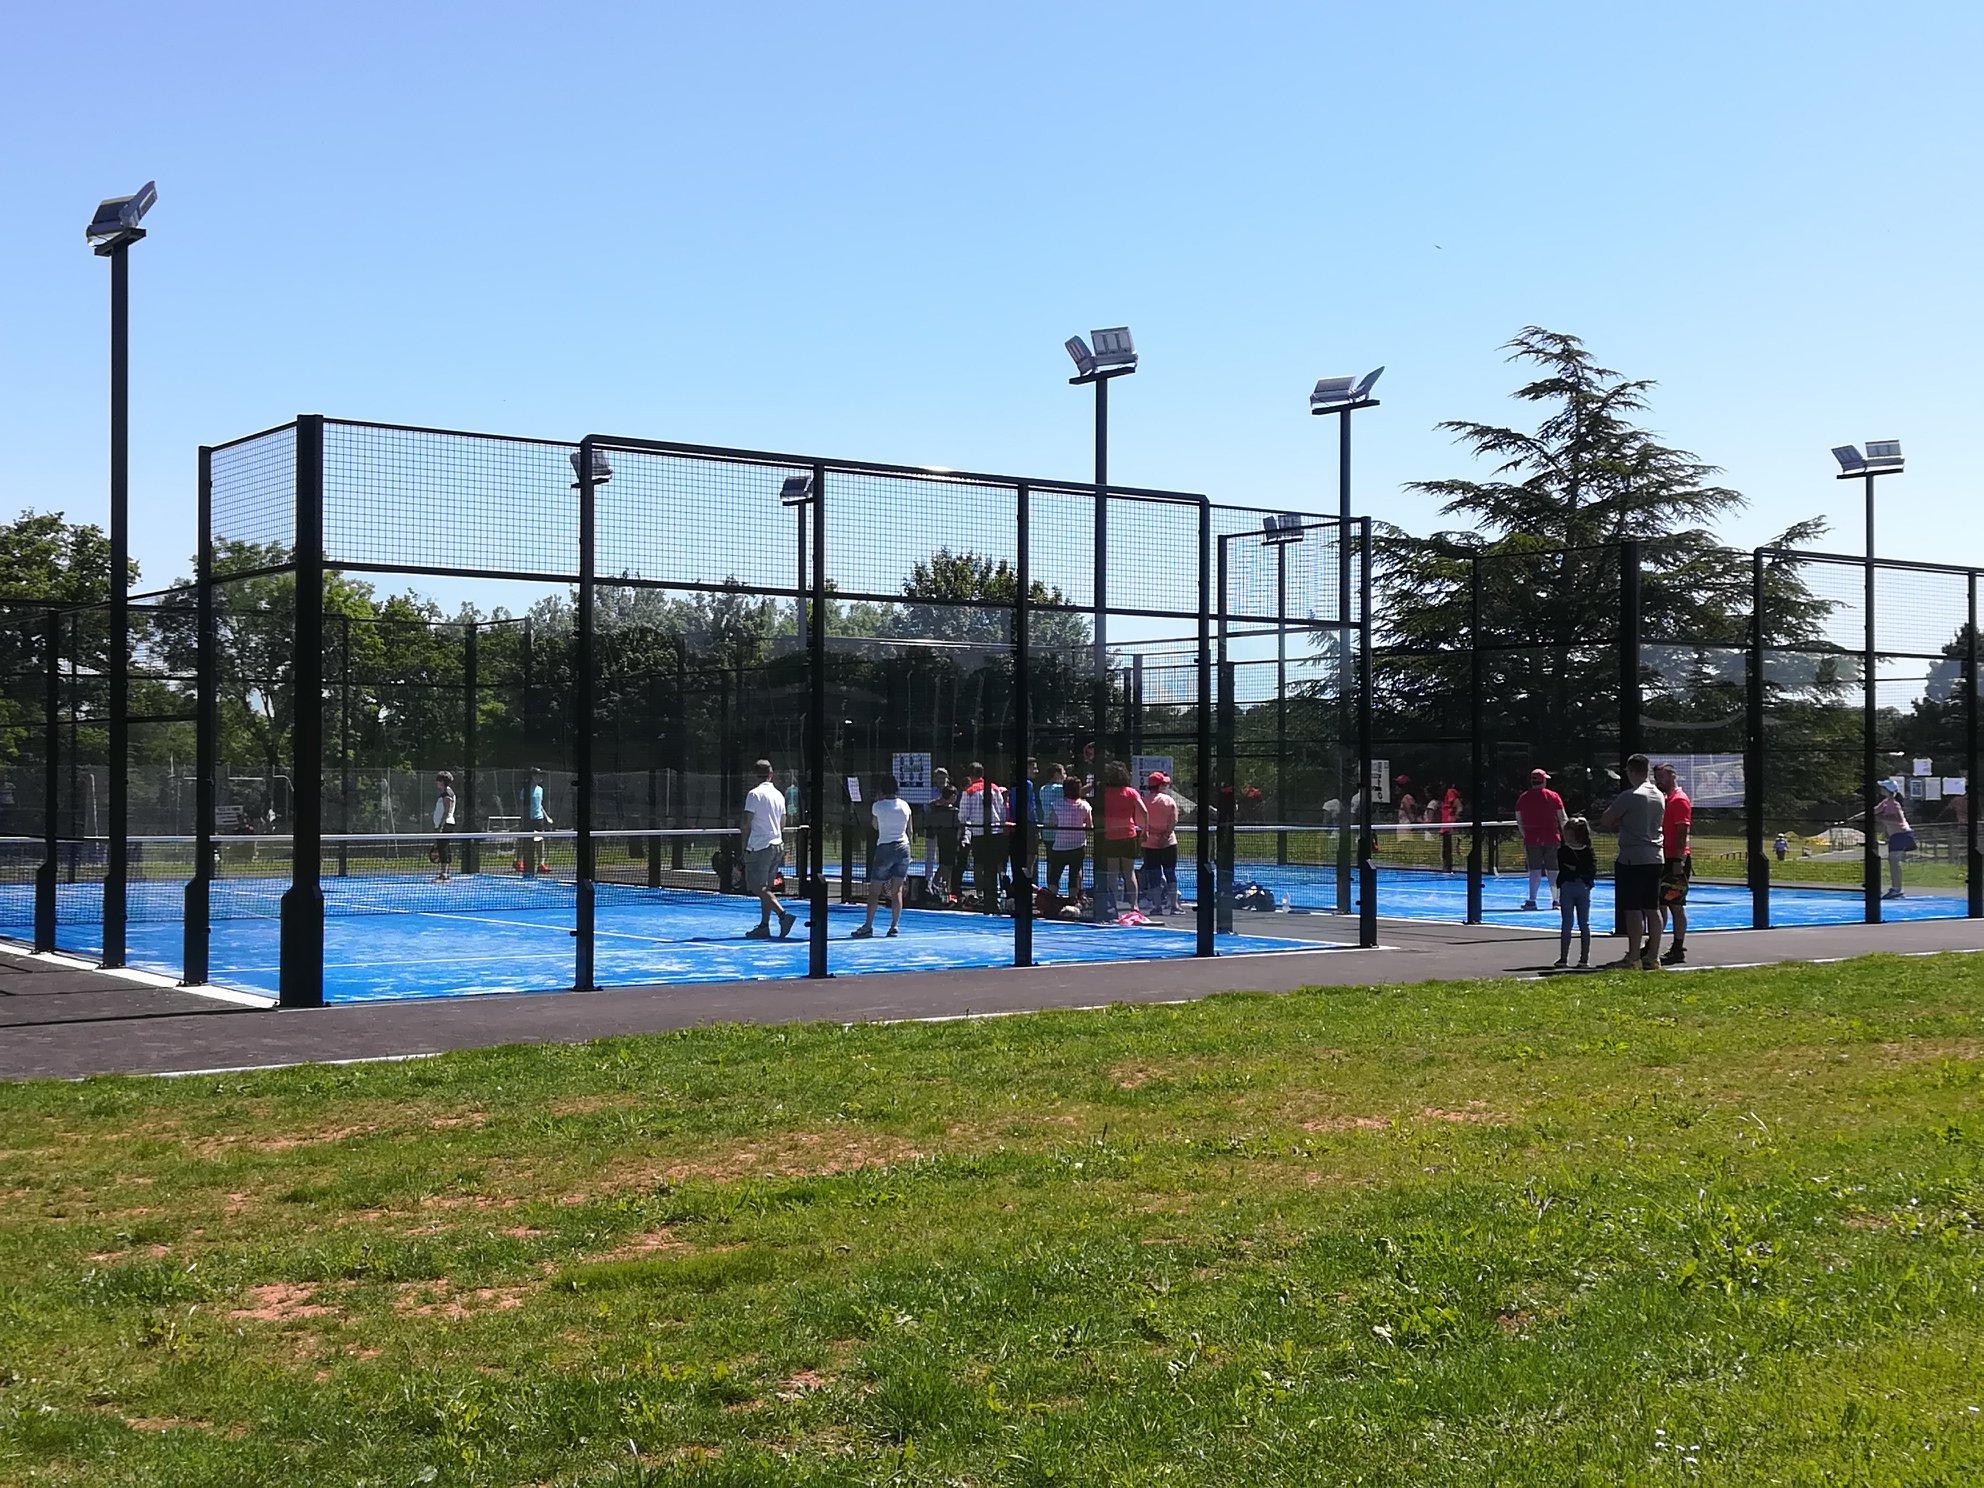 Le Stade ruthénois tennis a enfin ses padel